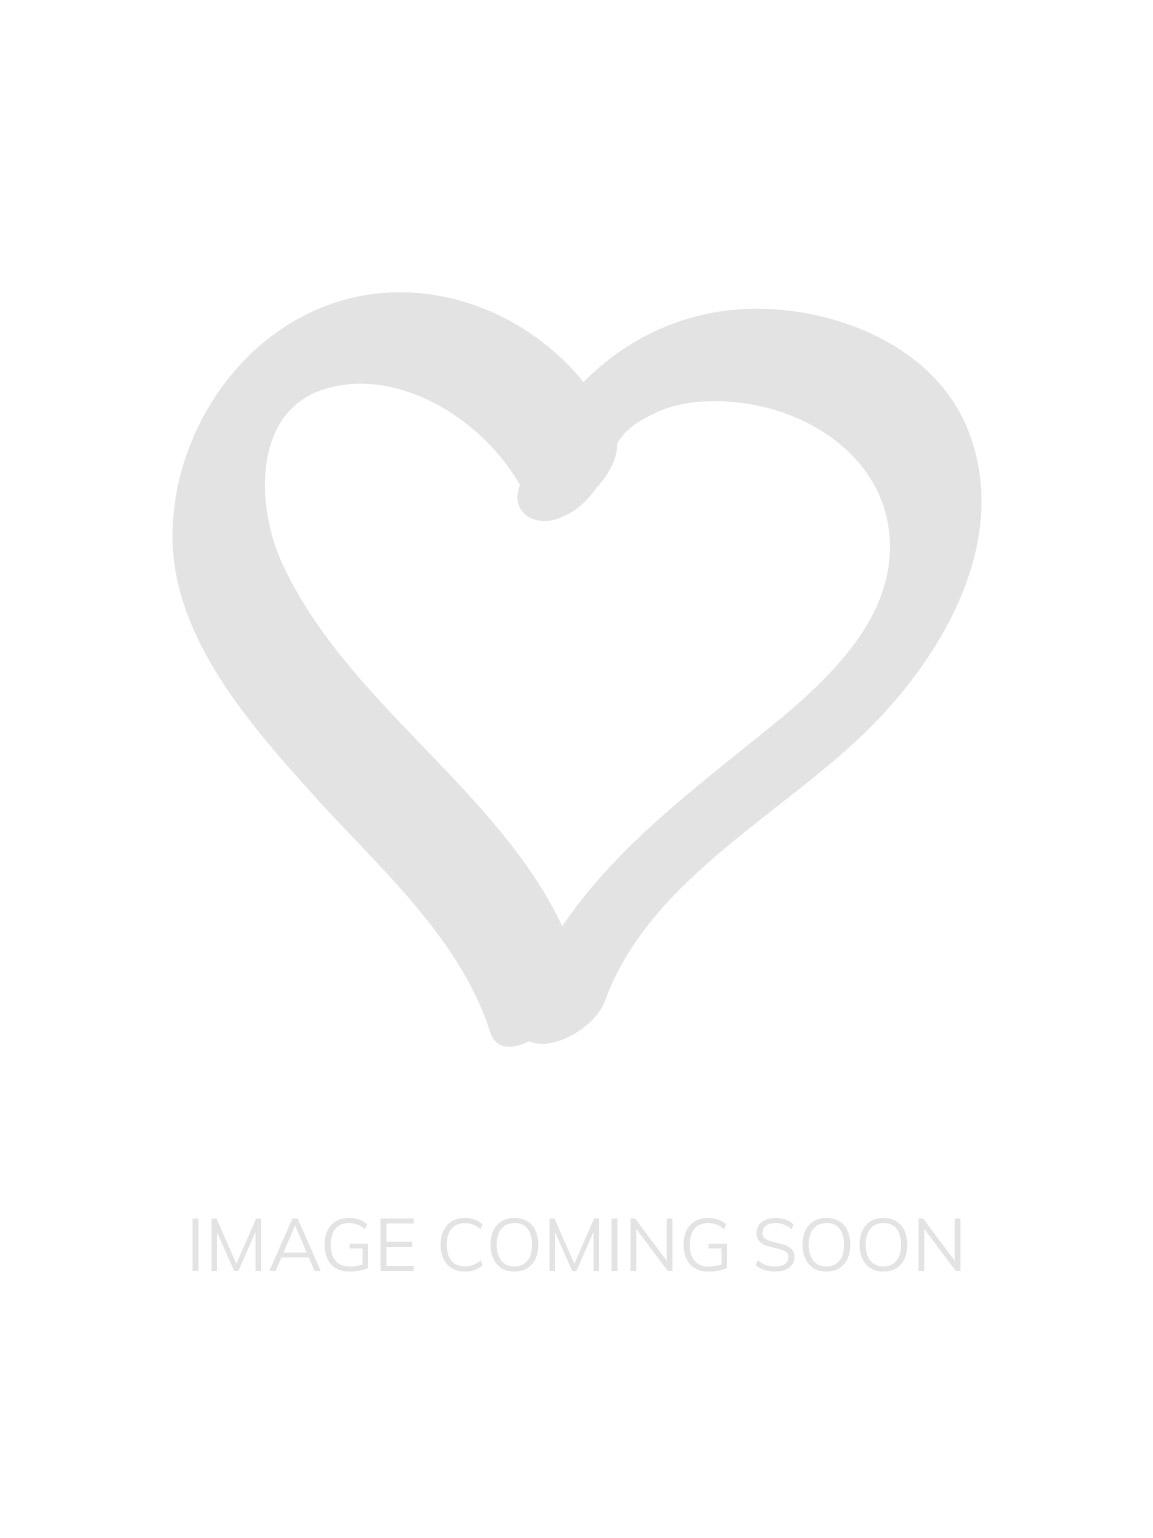 0faac6c98966b Sundance Halterneck Bikini Top - Cobalt | Lingerie Outlet Store